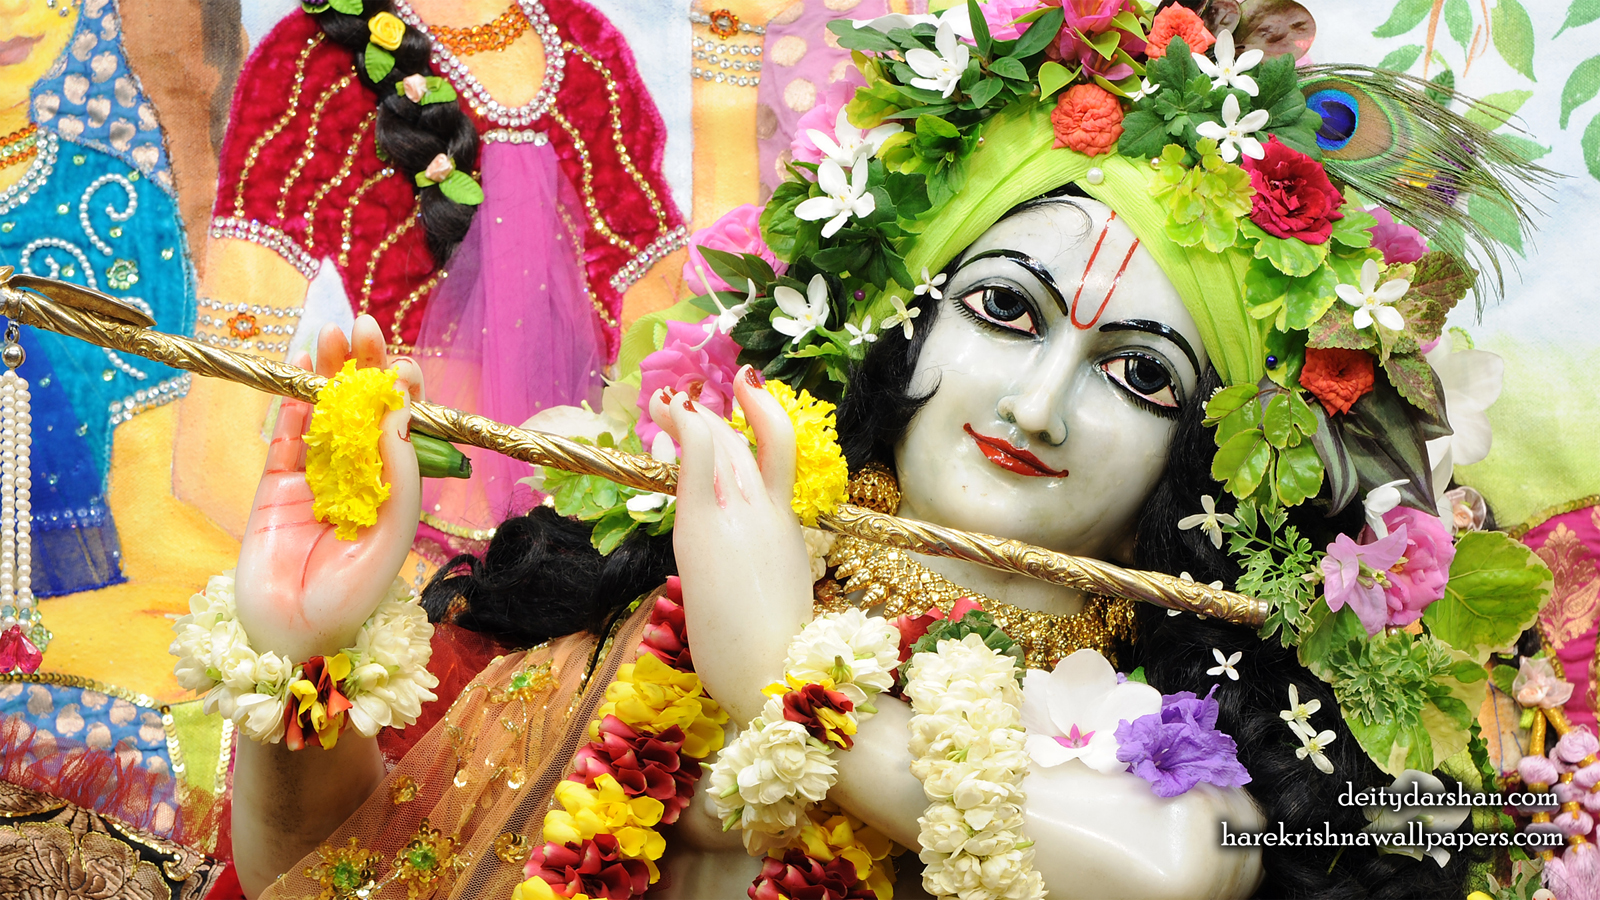 Sri Gopinath Close up Wallpaper (161) Size 1600x900 Download